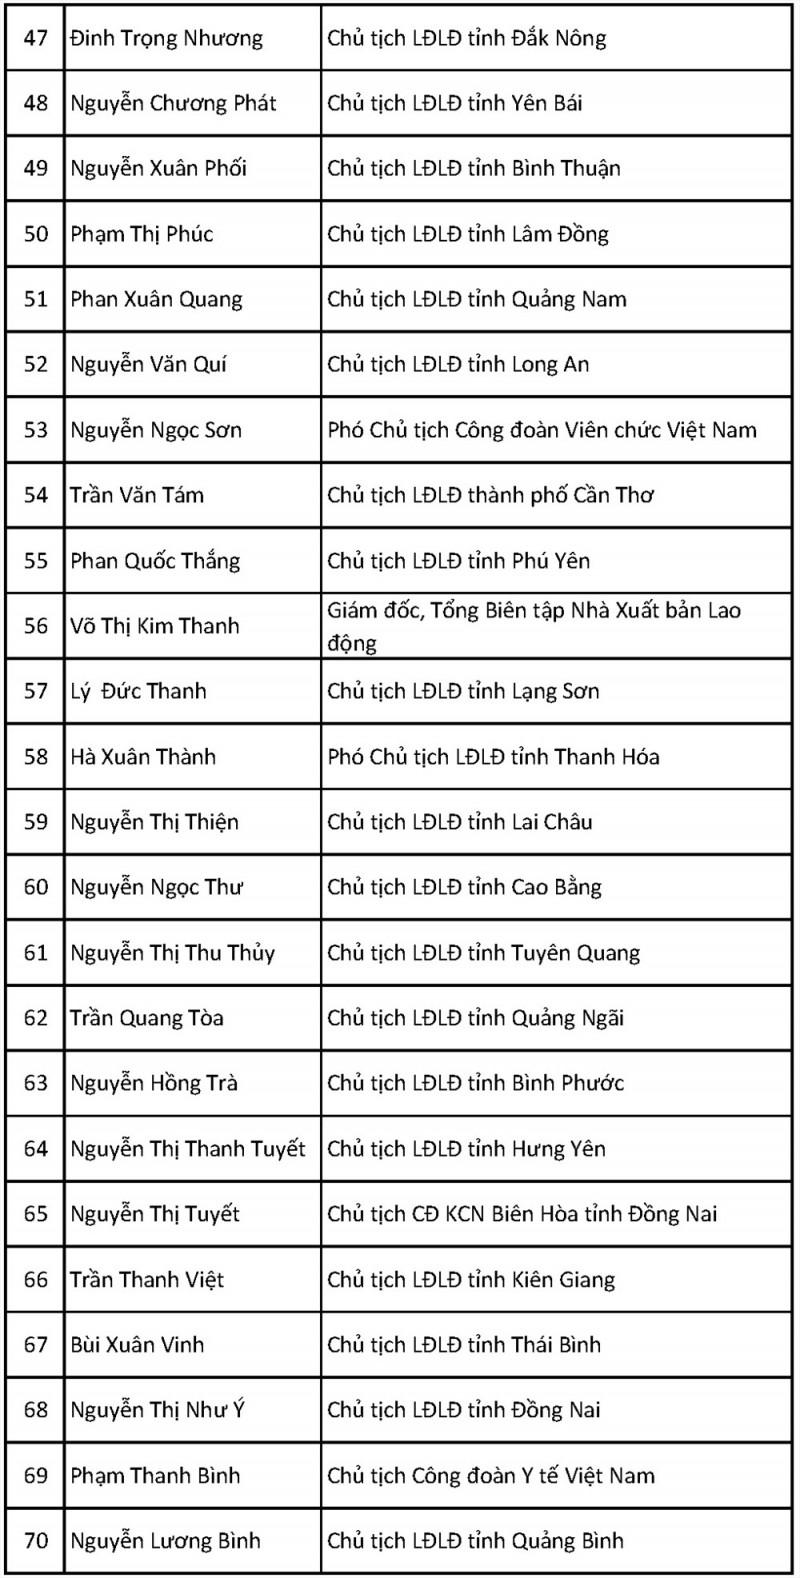 161 dai bieu uu tu trung cu vao ban chap hanh tong ldld viet nam khoa xii